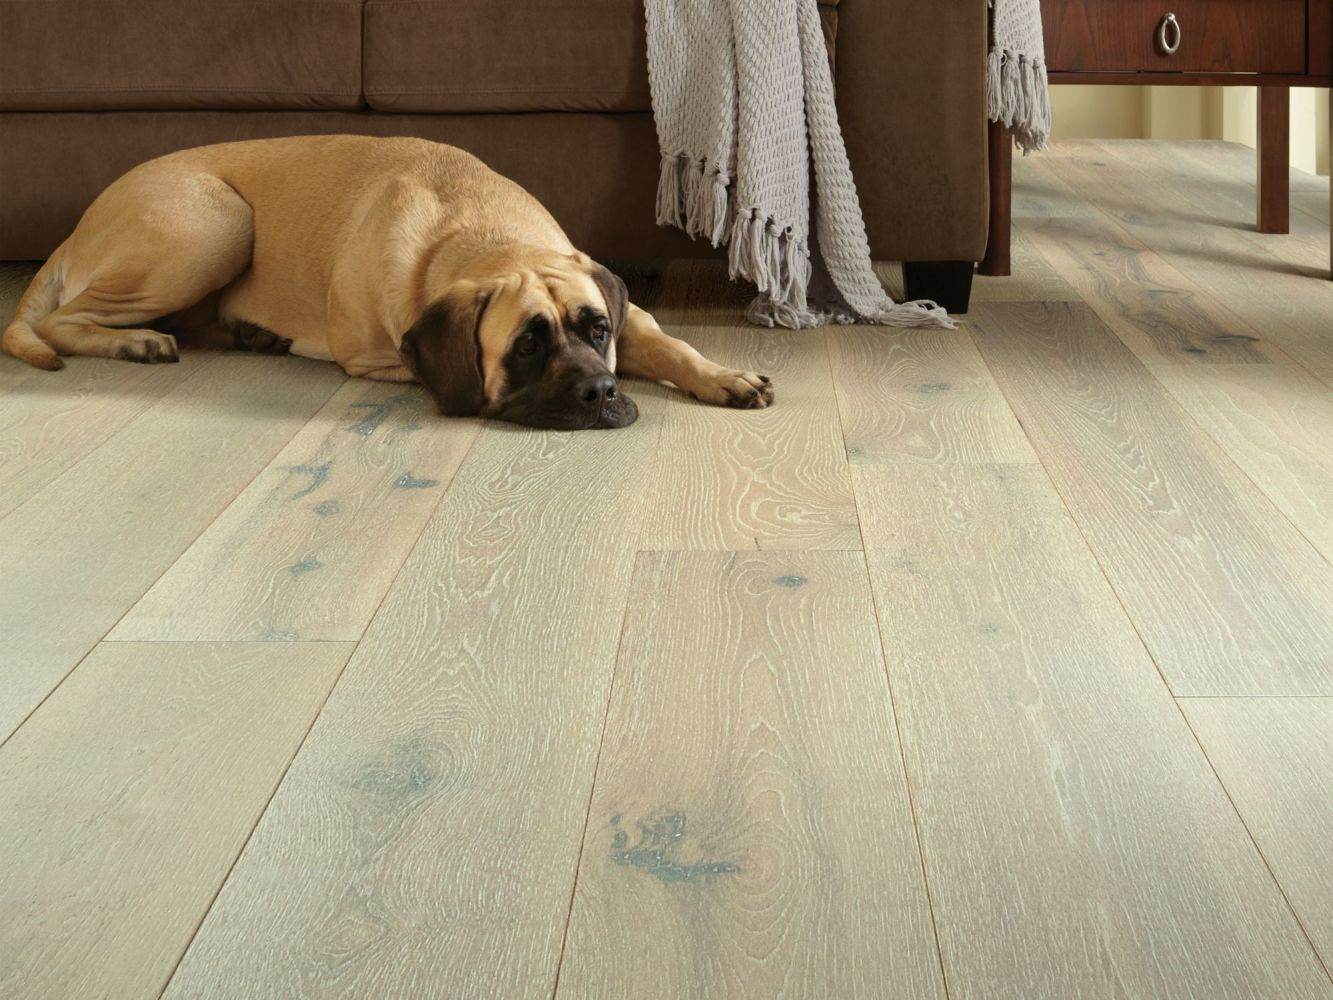 Shaw Floors Floorte Exquisite Warm Hickory 01052_CWFW1